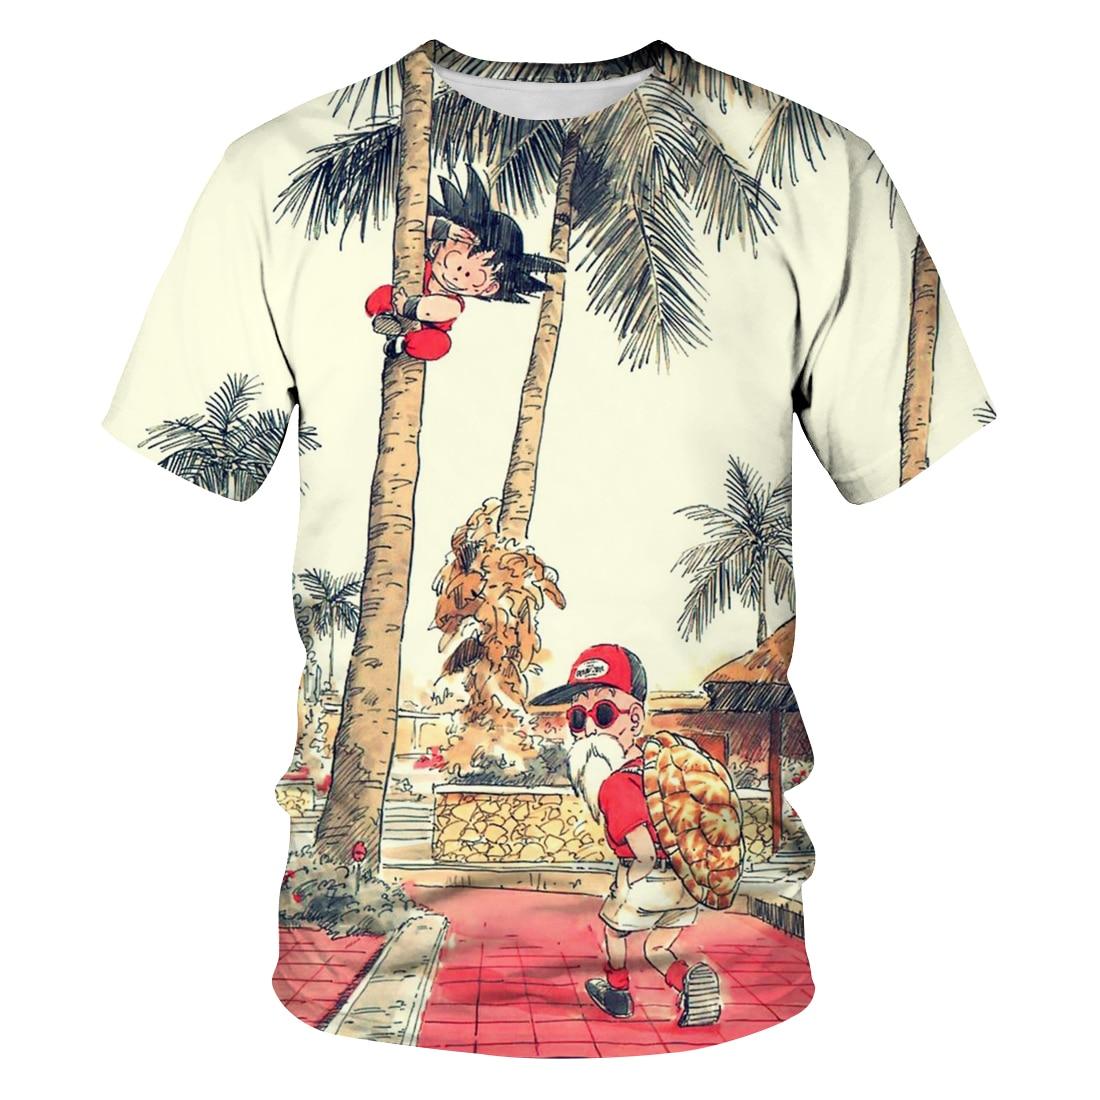 2020 hot new men and women 3D anime dragon ball printed short sleeve T-shirt tops